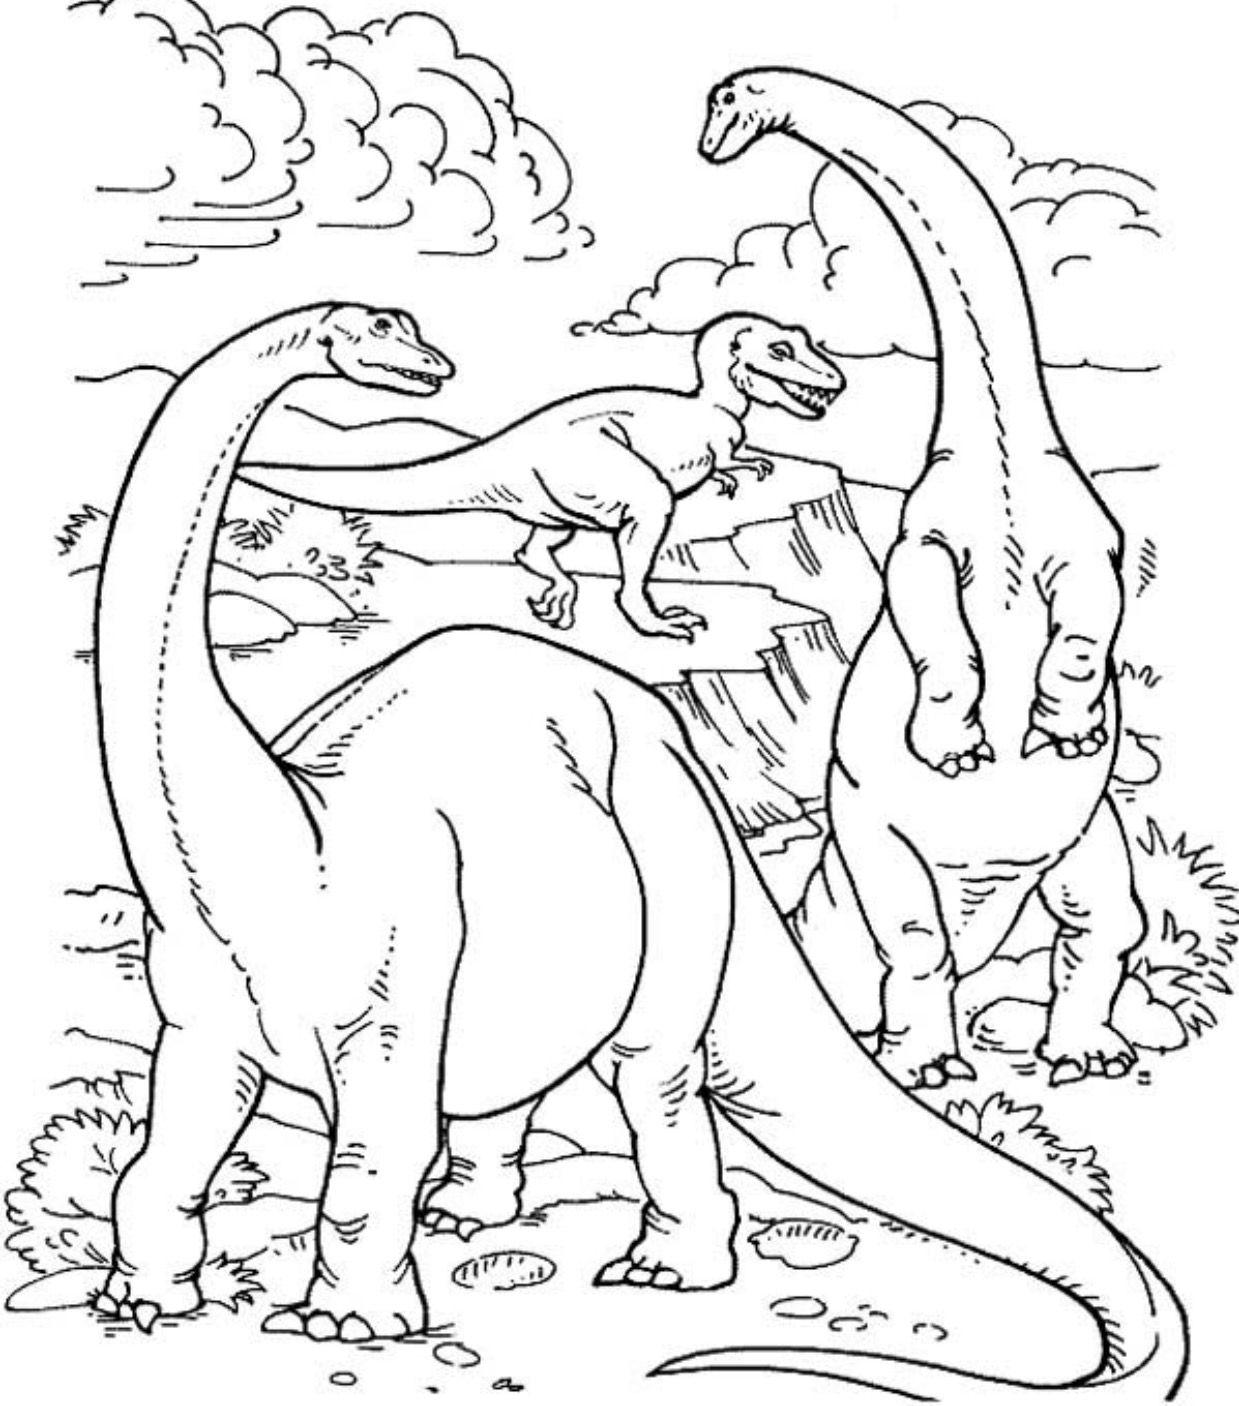 Pin By Osh Gawsh On Discipline N Empowerment Pinterest Dinosaur